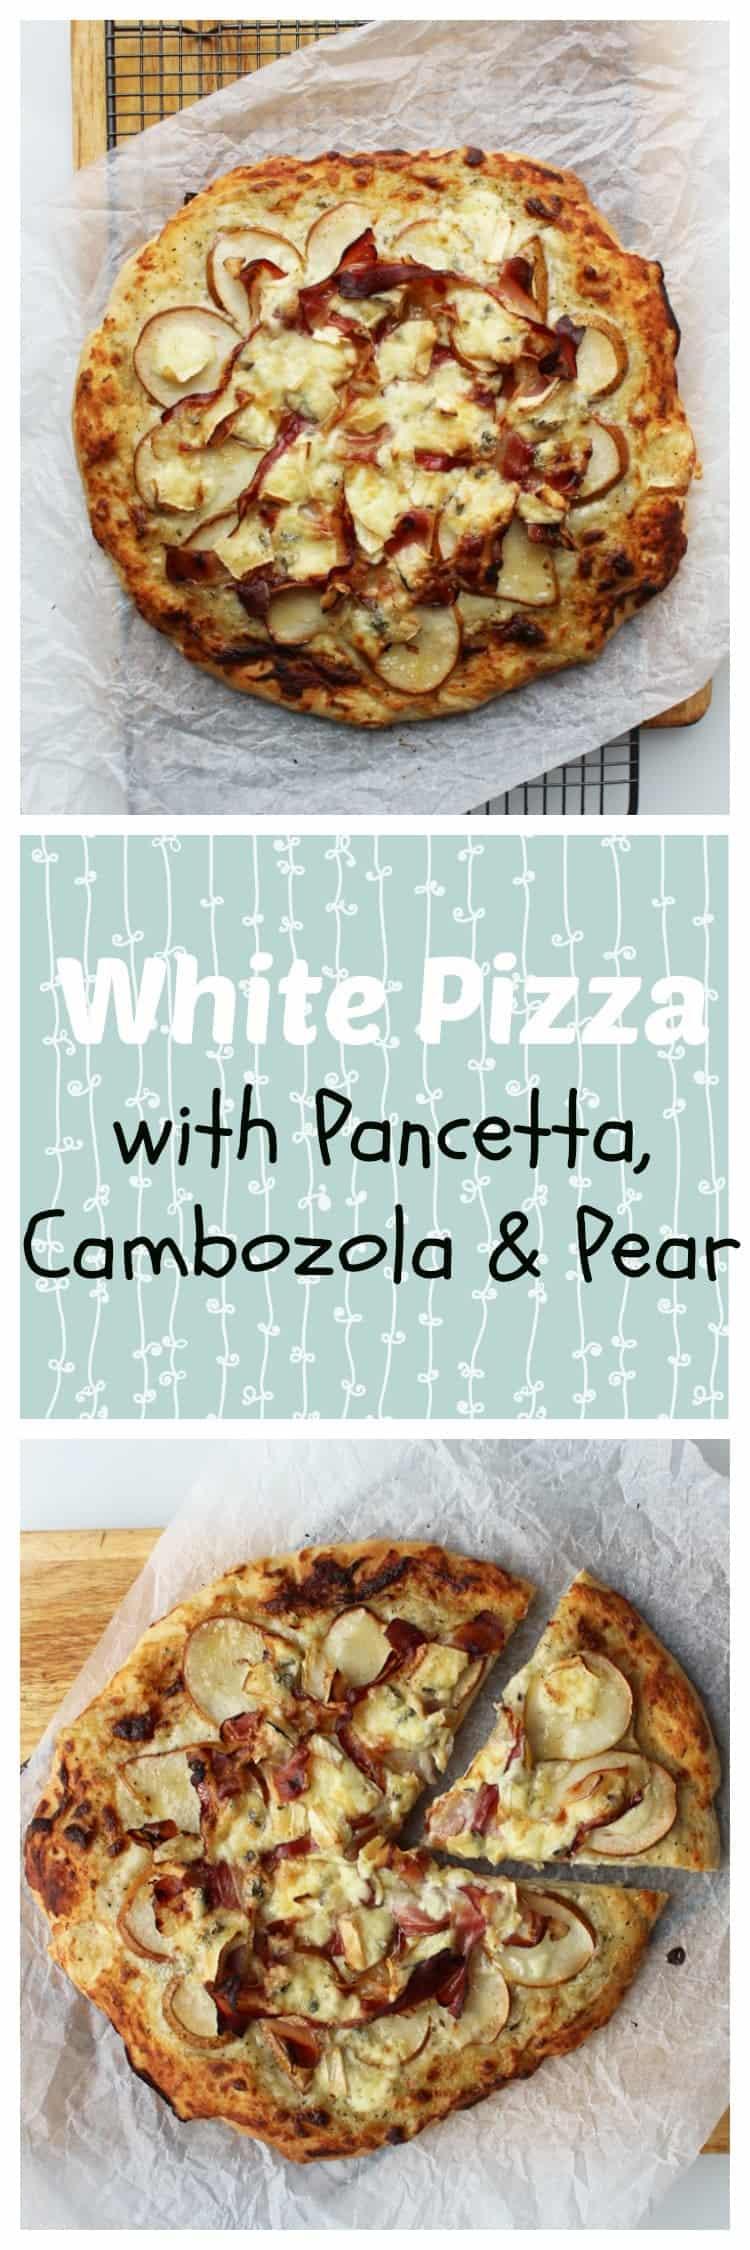 White pizza with pancetta, cambozola & pear